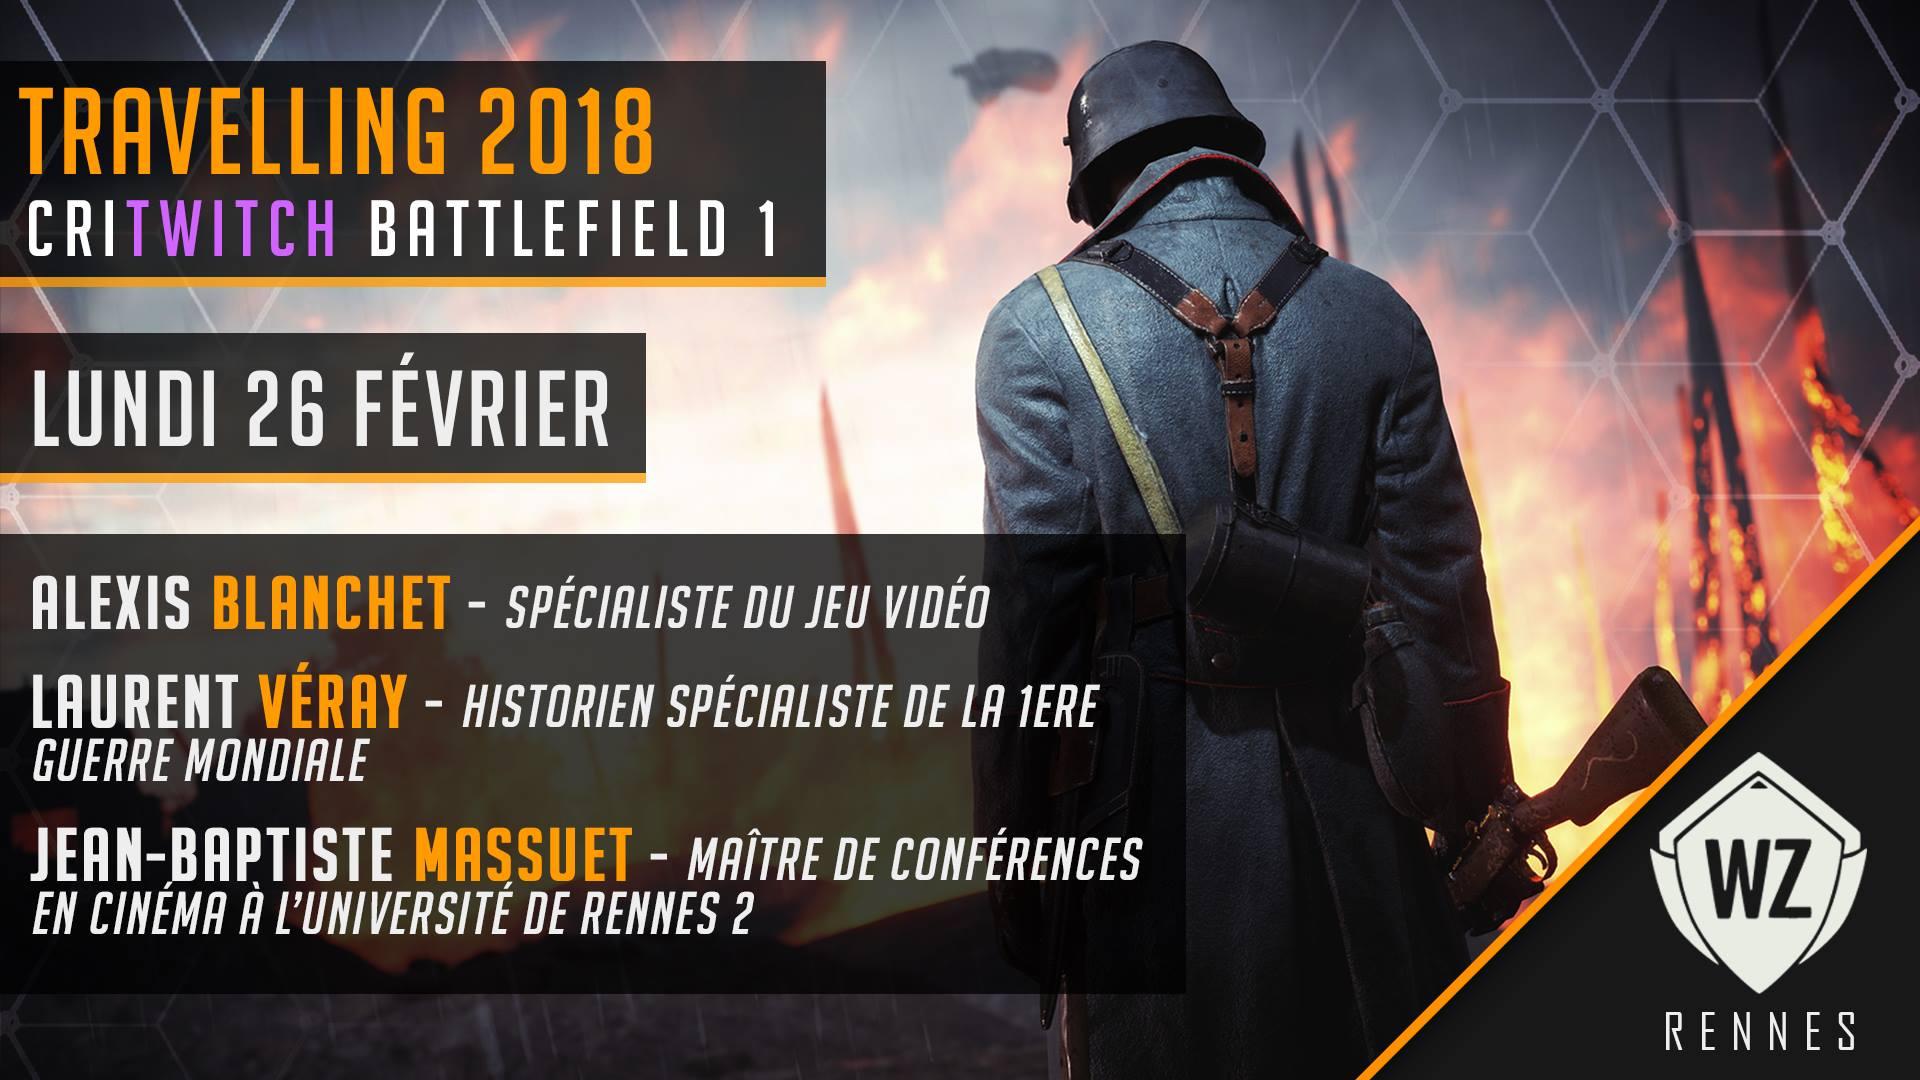 Critwitch Battlefield 1